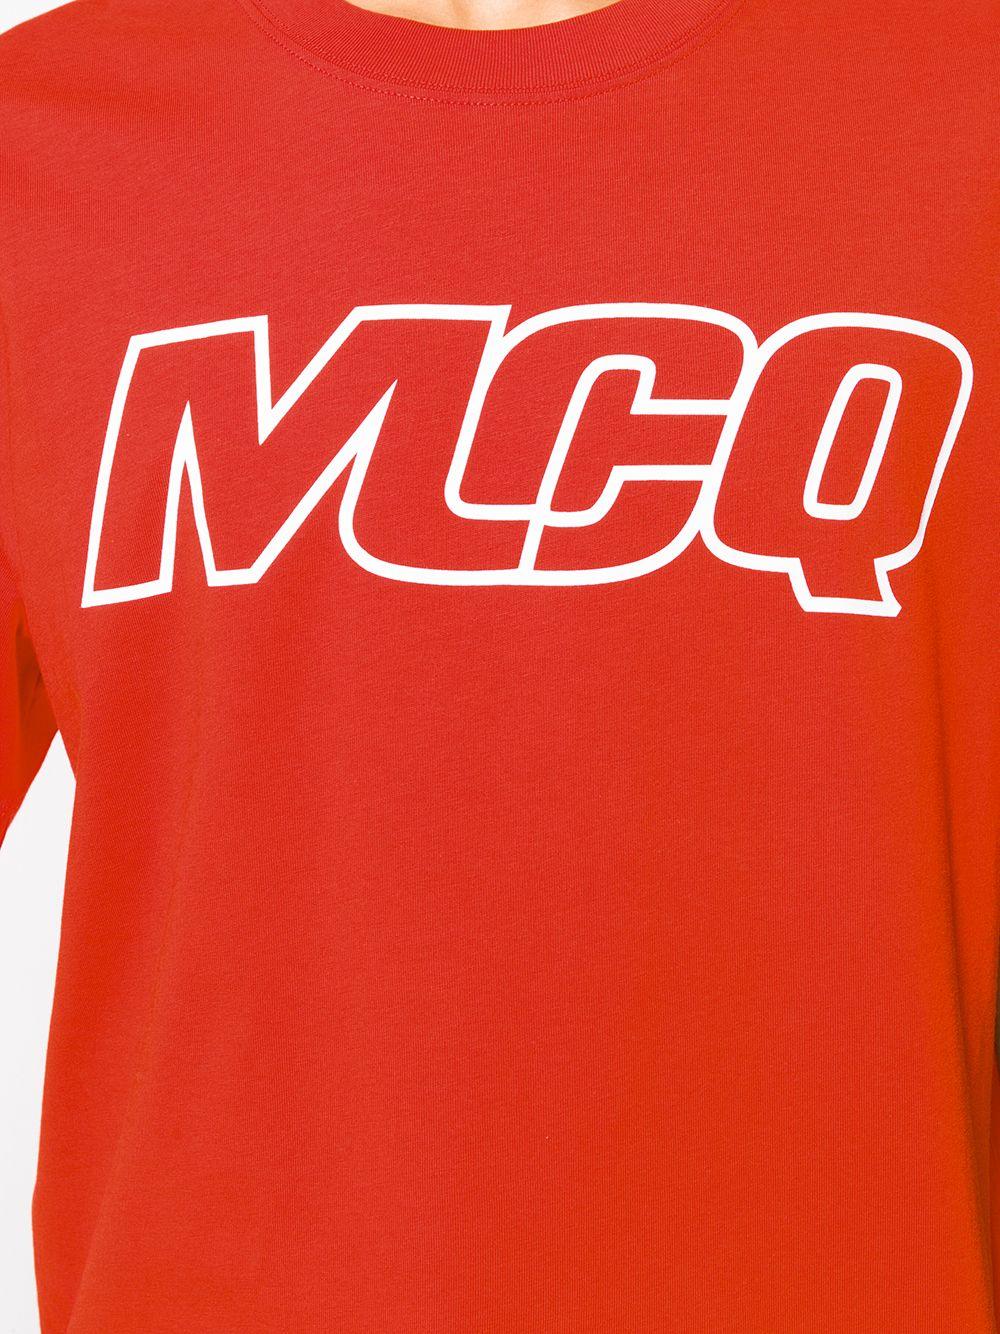 mcq swallow logo print t shirt farfetch print t shirt mcq alexander mcqueen edgy fashion chic print t shirt mcq alexander mcqueen